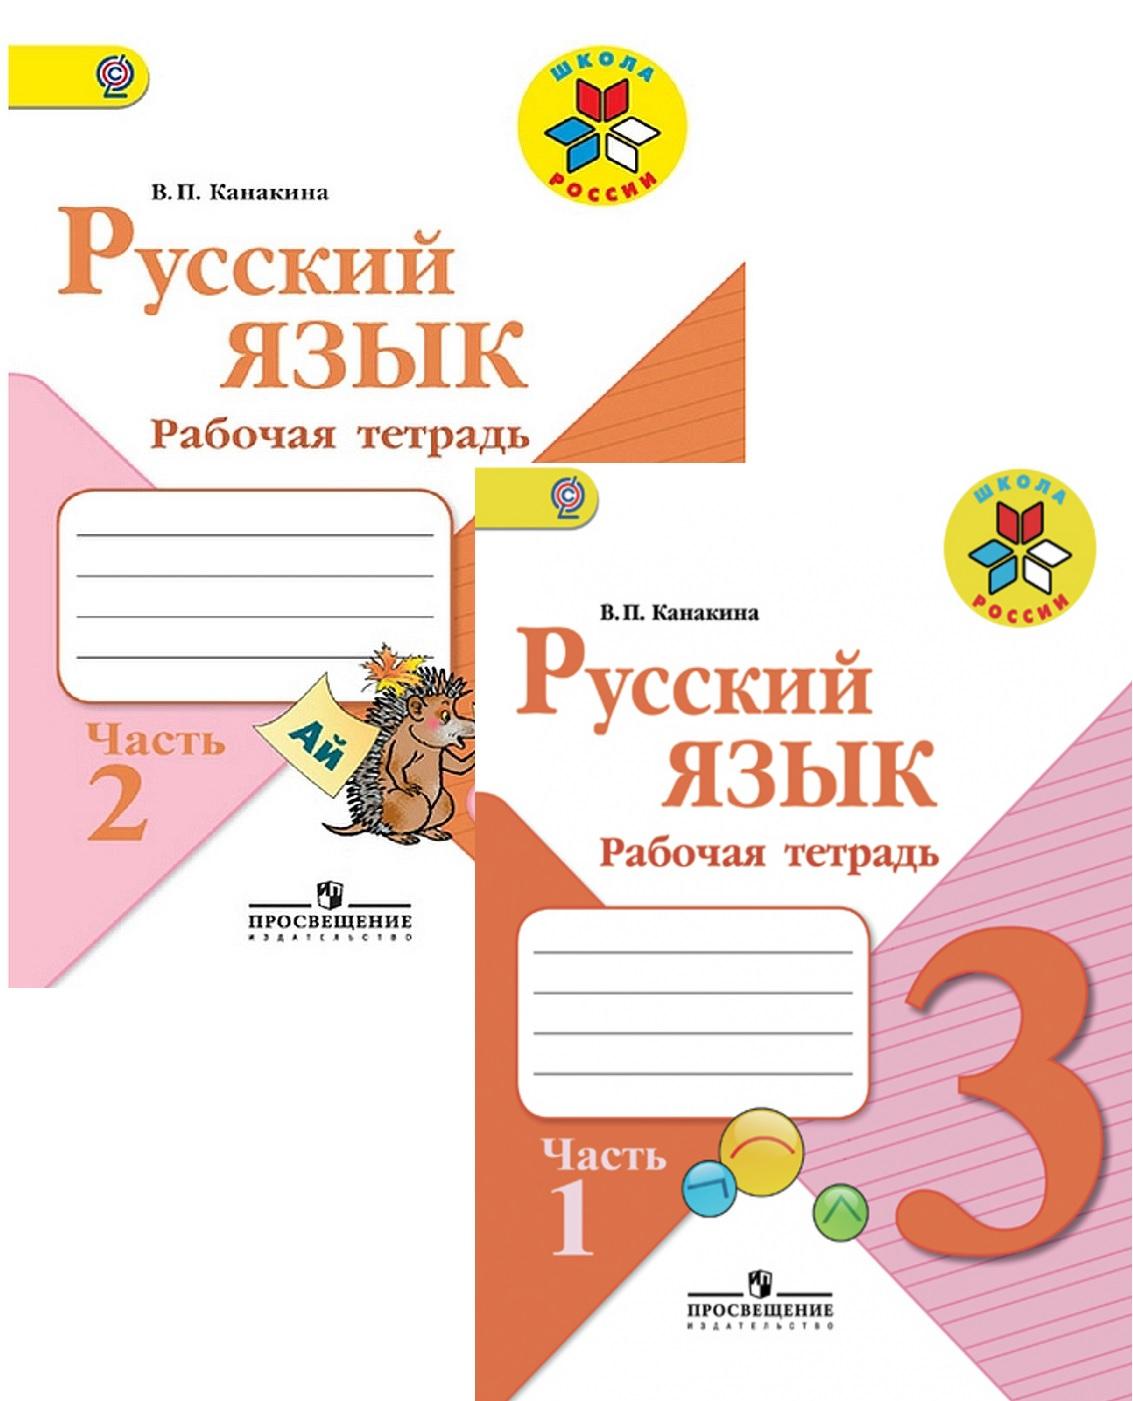 Russkij jazyk. 3 klass. Rabochaja tetrad. V 2 chastjakh